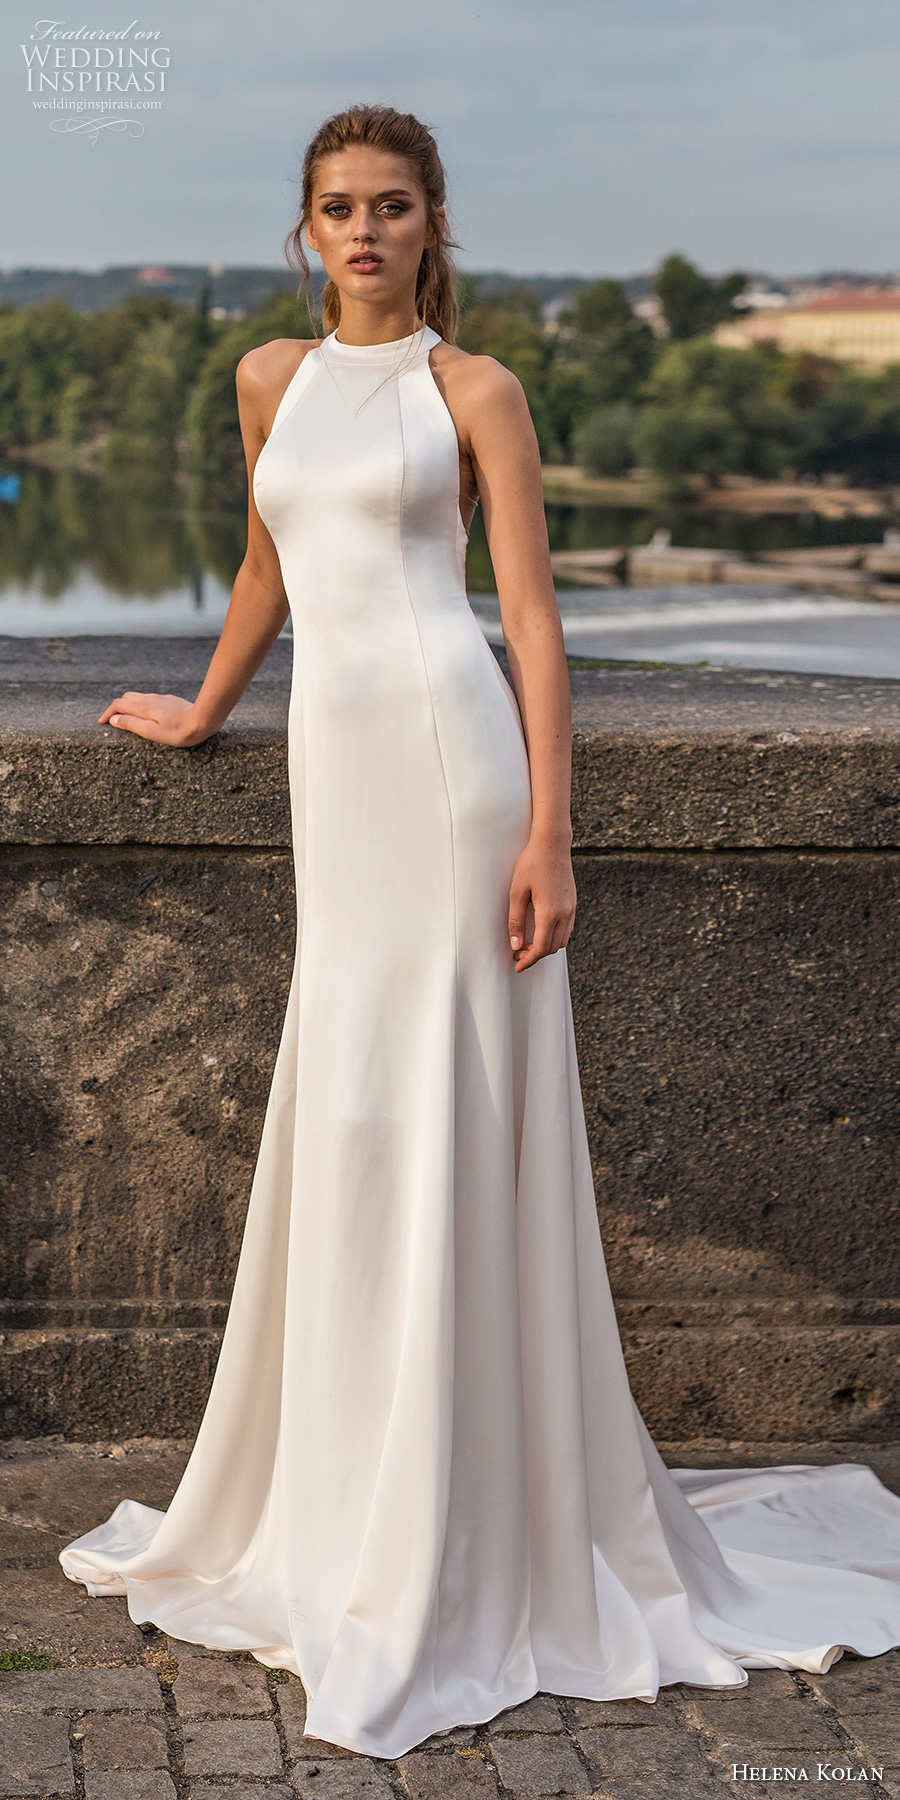 helena kolan 2019 bridal sleeveless halter neck simple clean minimalist elegant drop waist modified a  line wedding dress rasor back medium train (16) mv